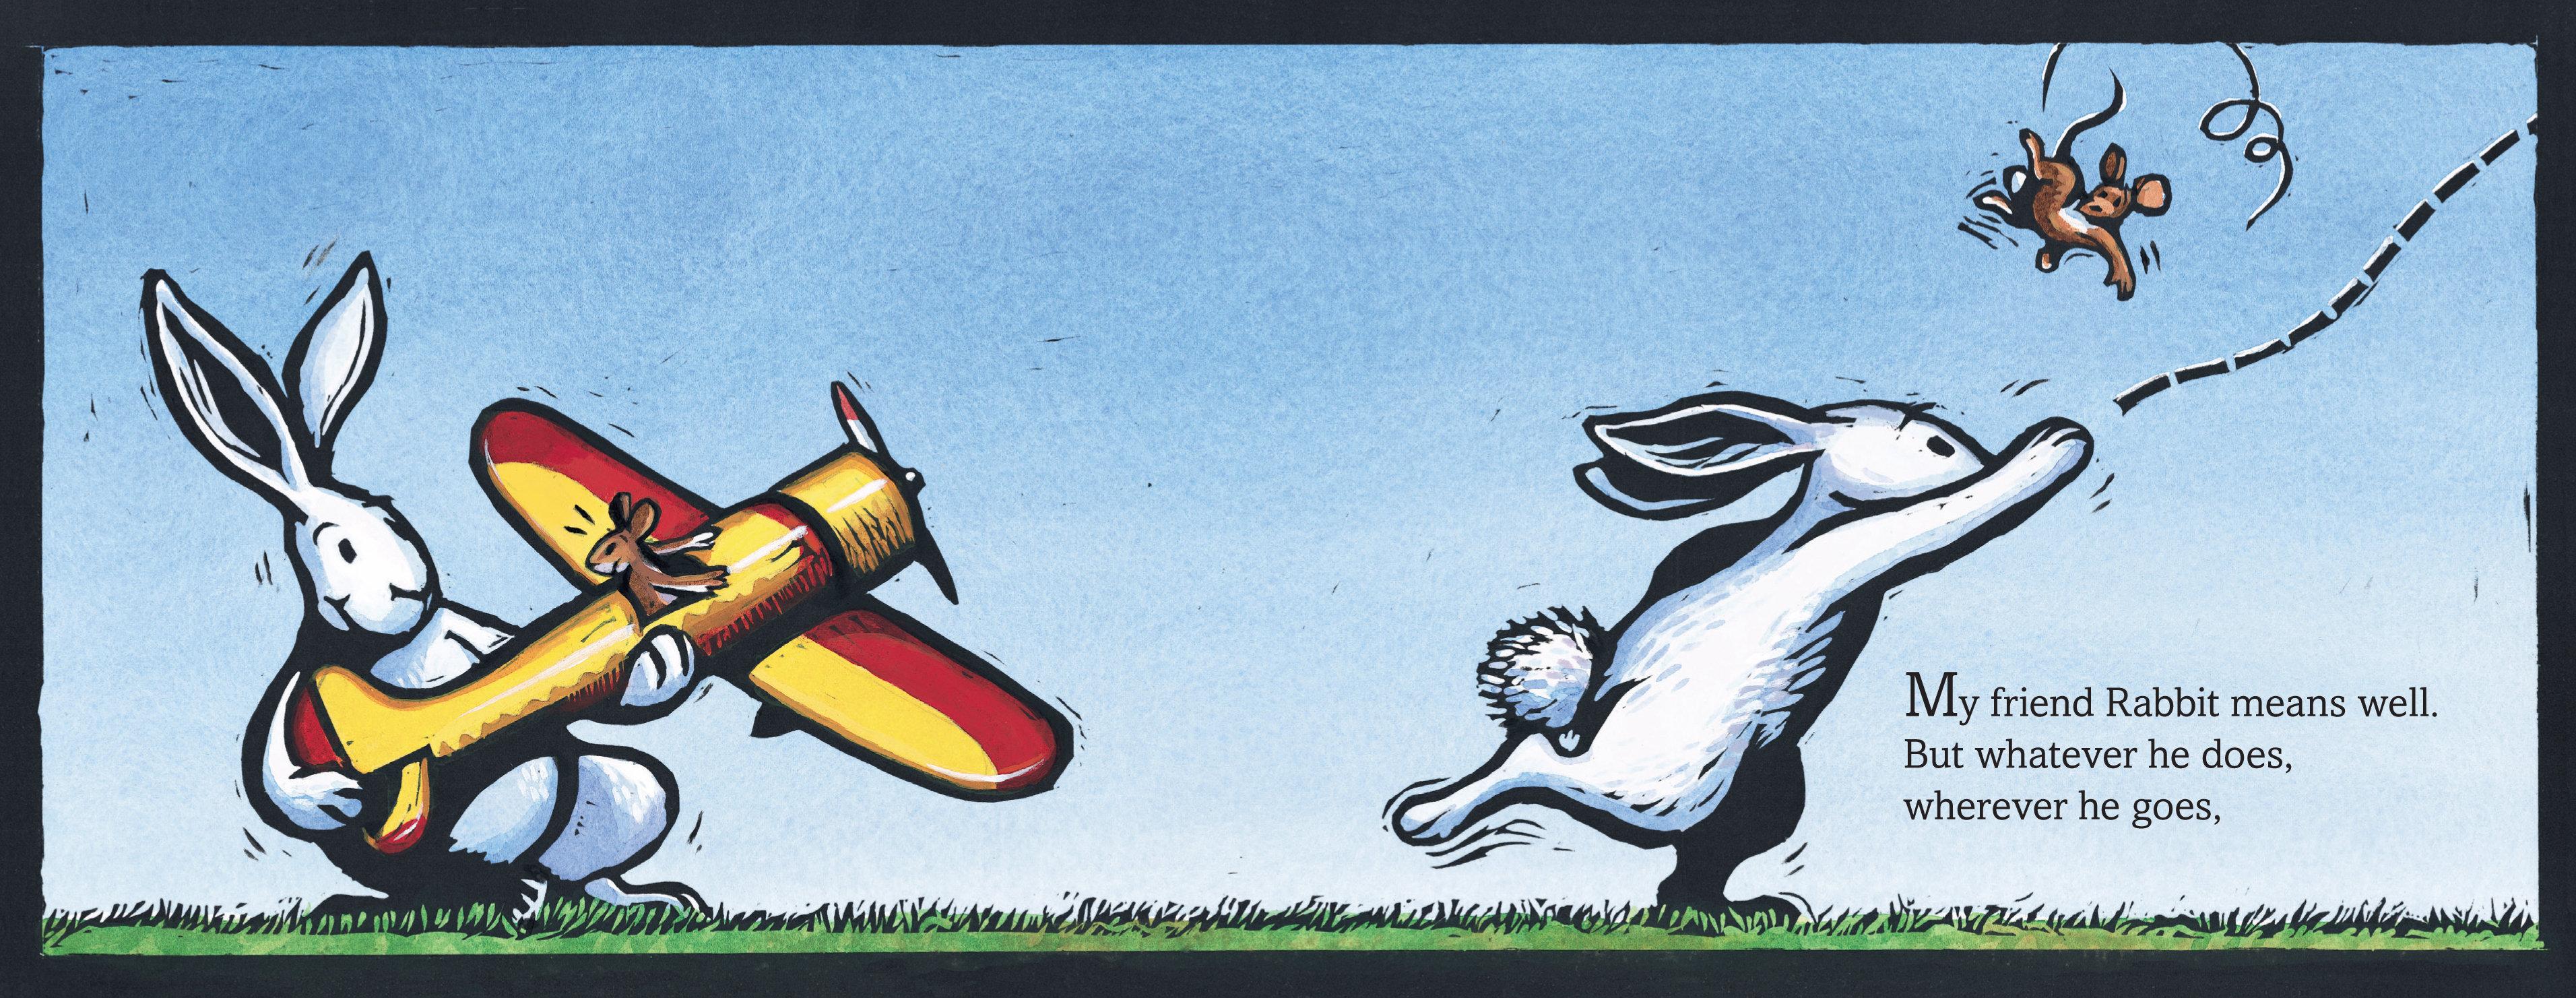 My Friend Rabbit: Eric Rohmann: 9780312367527: Amazon.com: Books